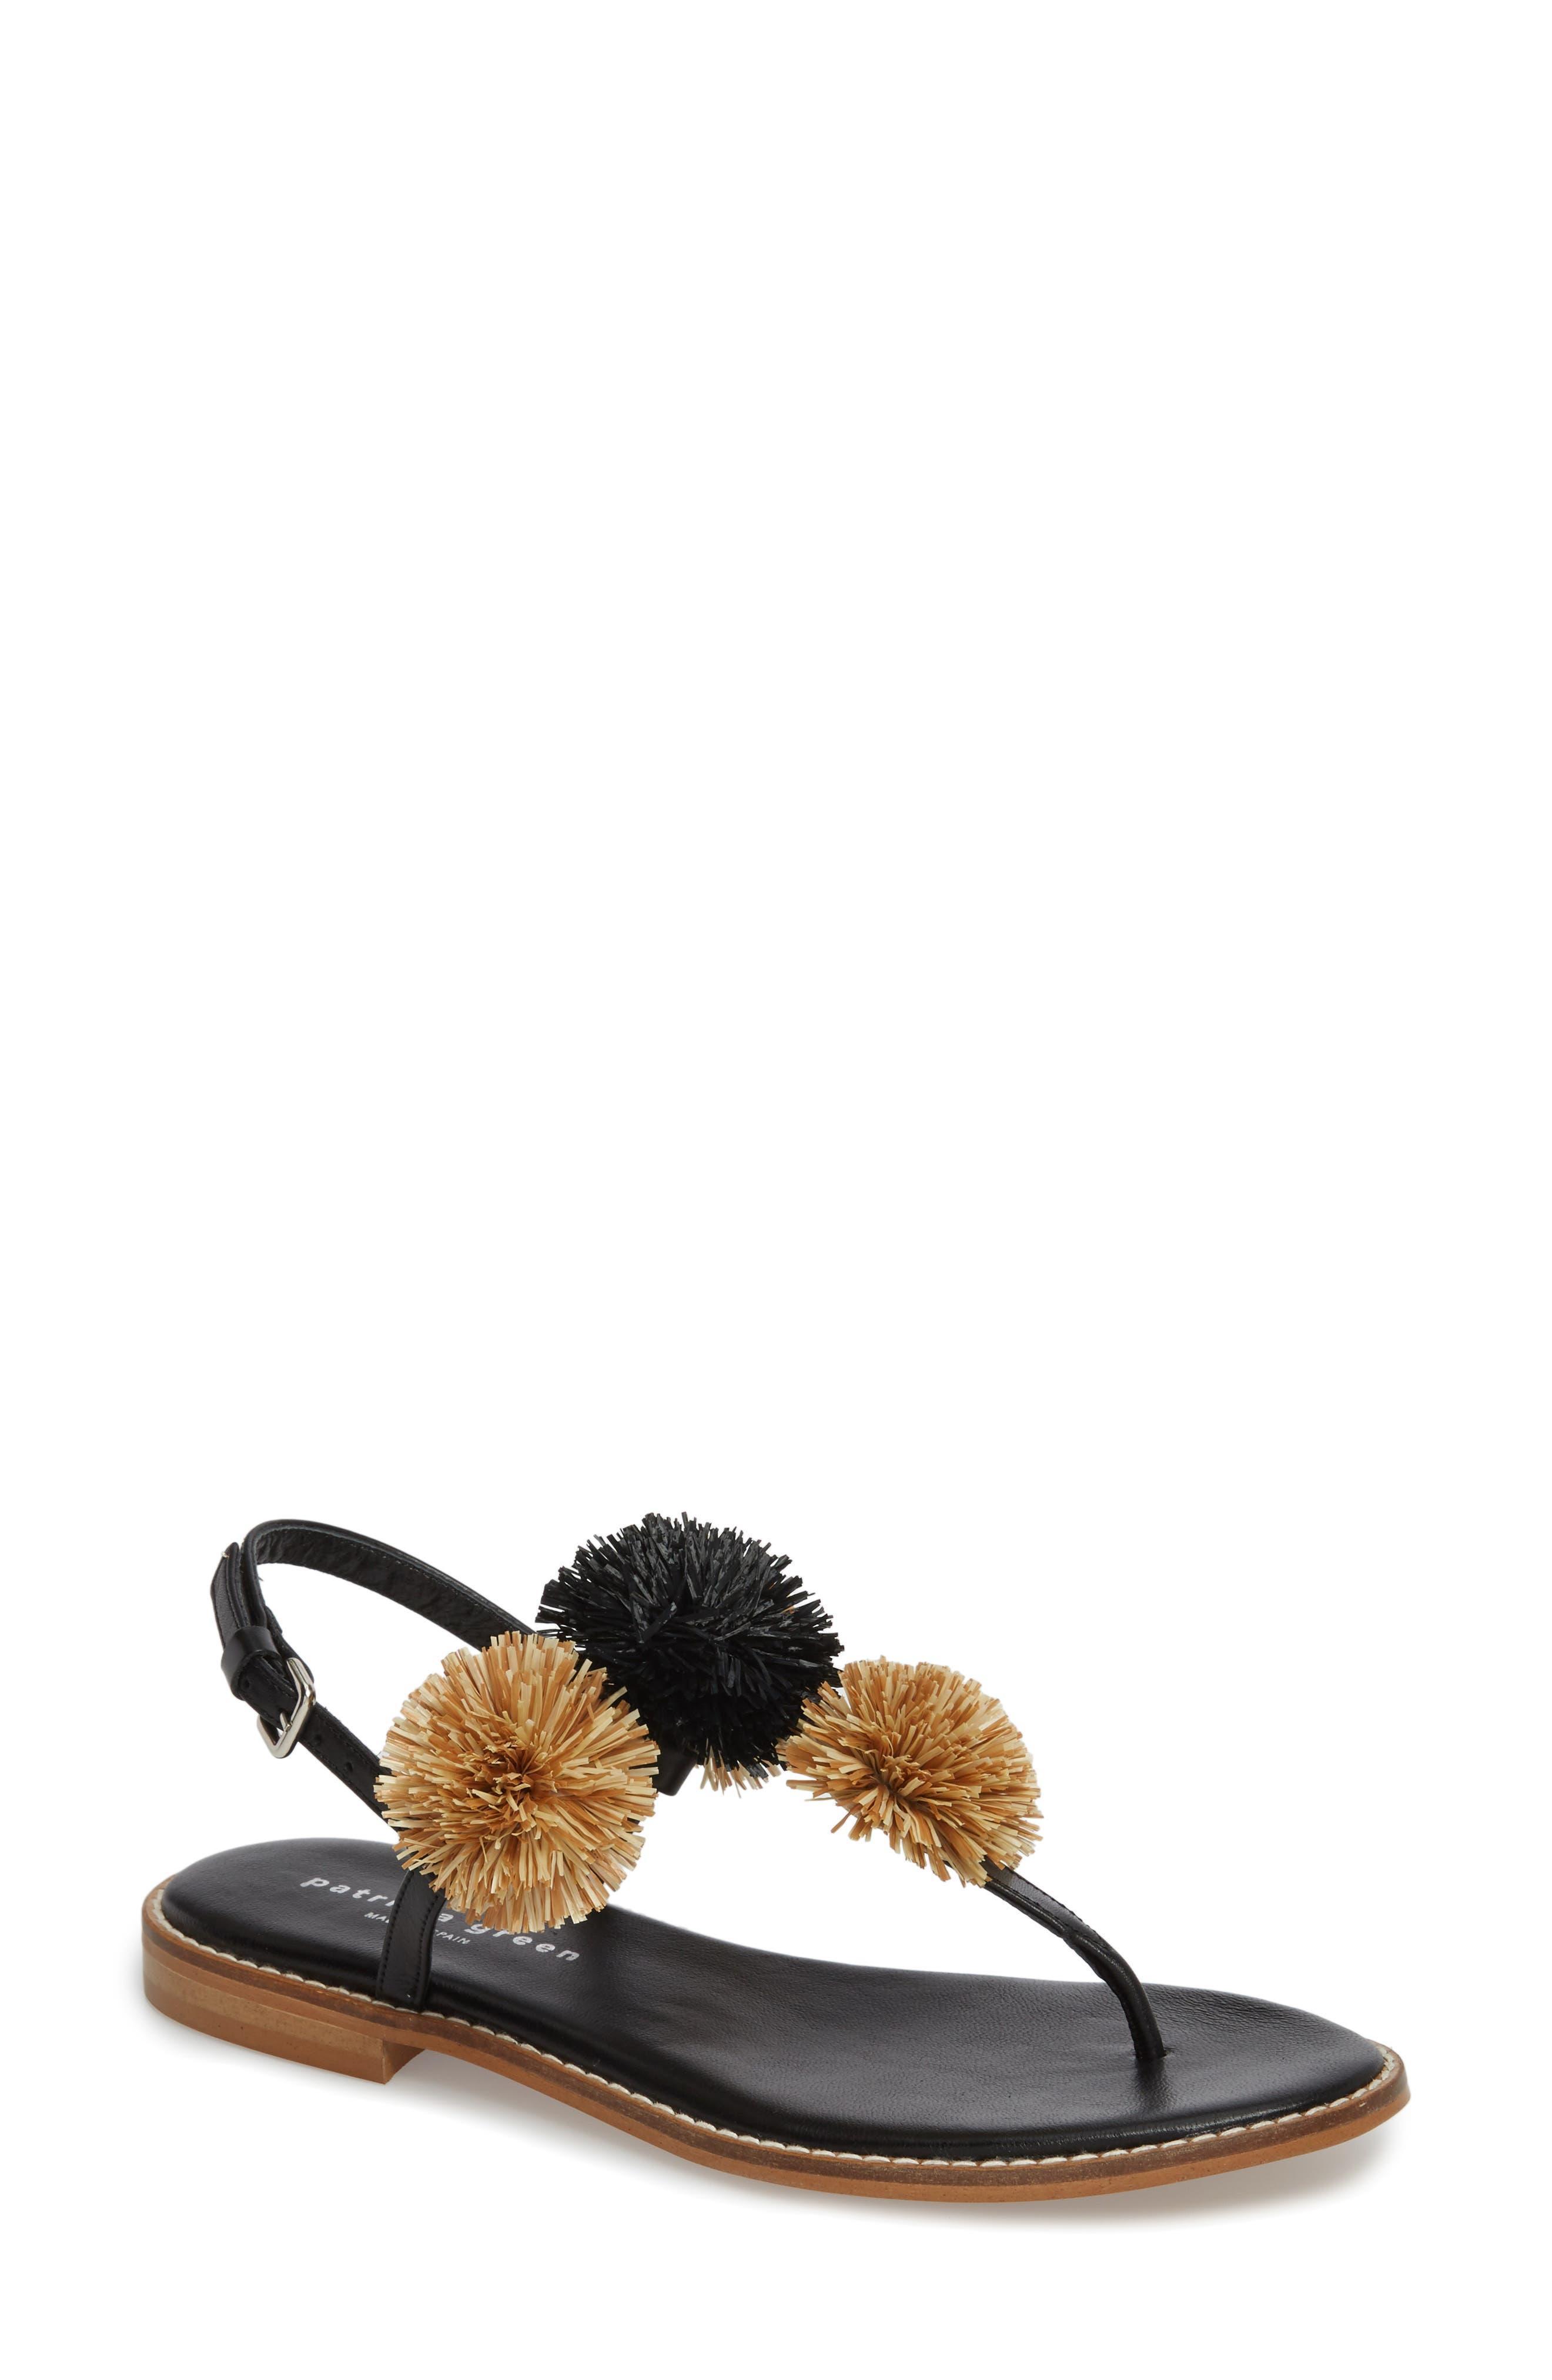 Pompom Thong Sandal,                             Main thumbnail 1, color,                             Black Leather